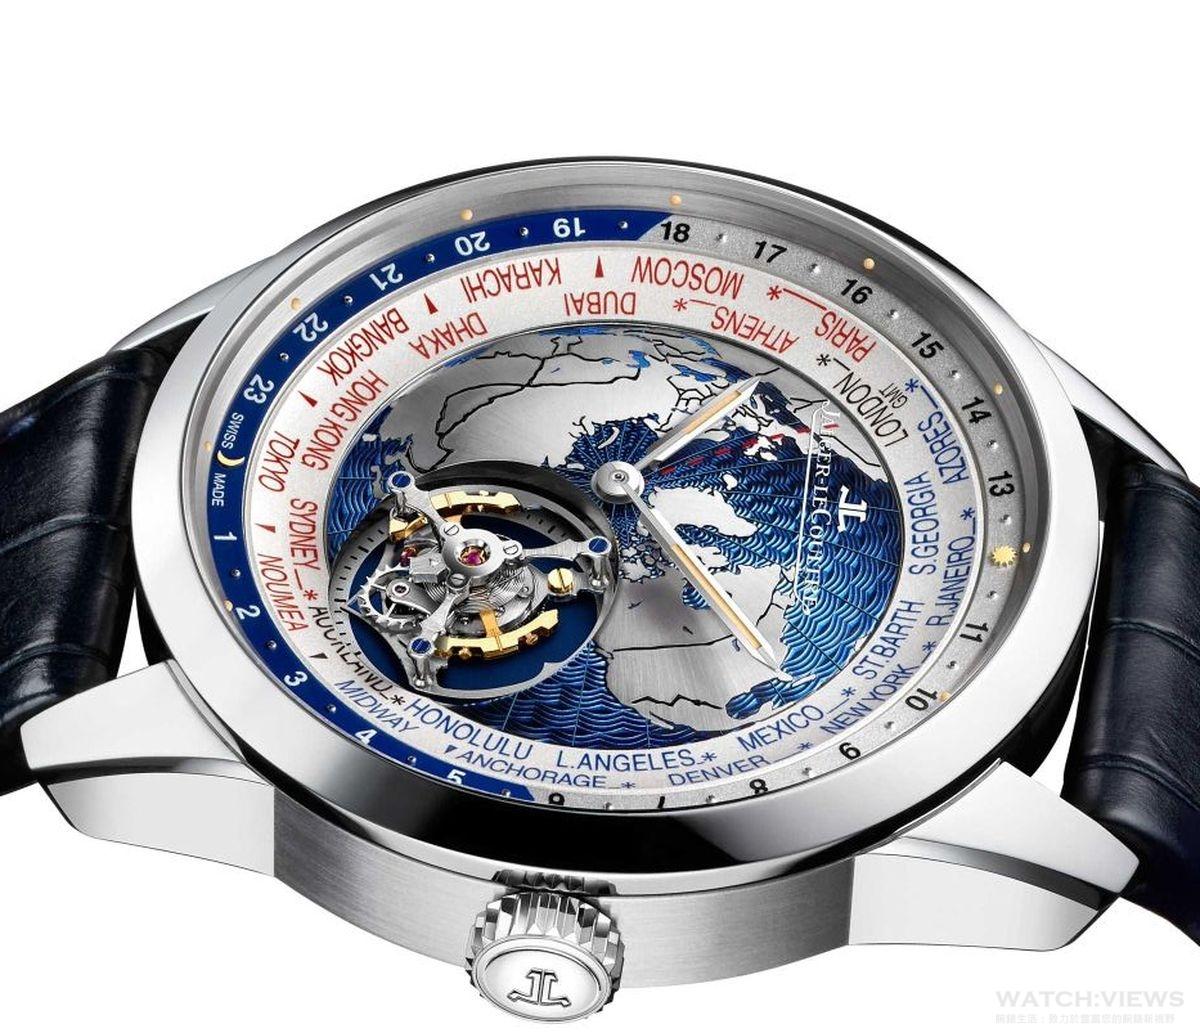 【2017 Pre-SIHH報導】積家Jaeger-LeCoultre Geophysic Tourbillon Universal Time